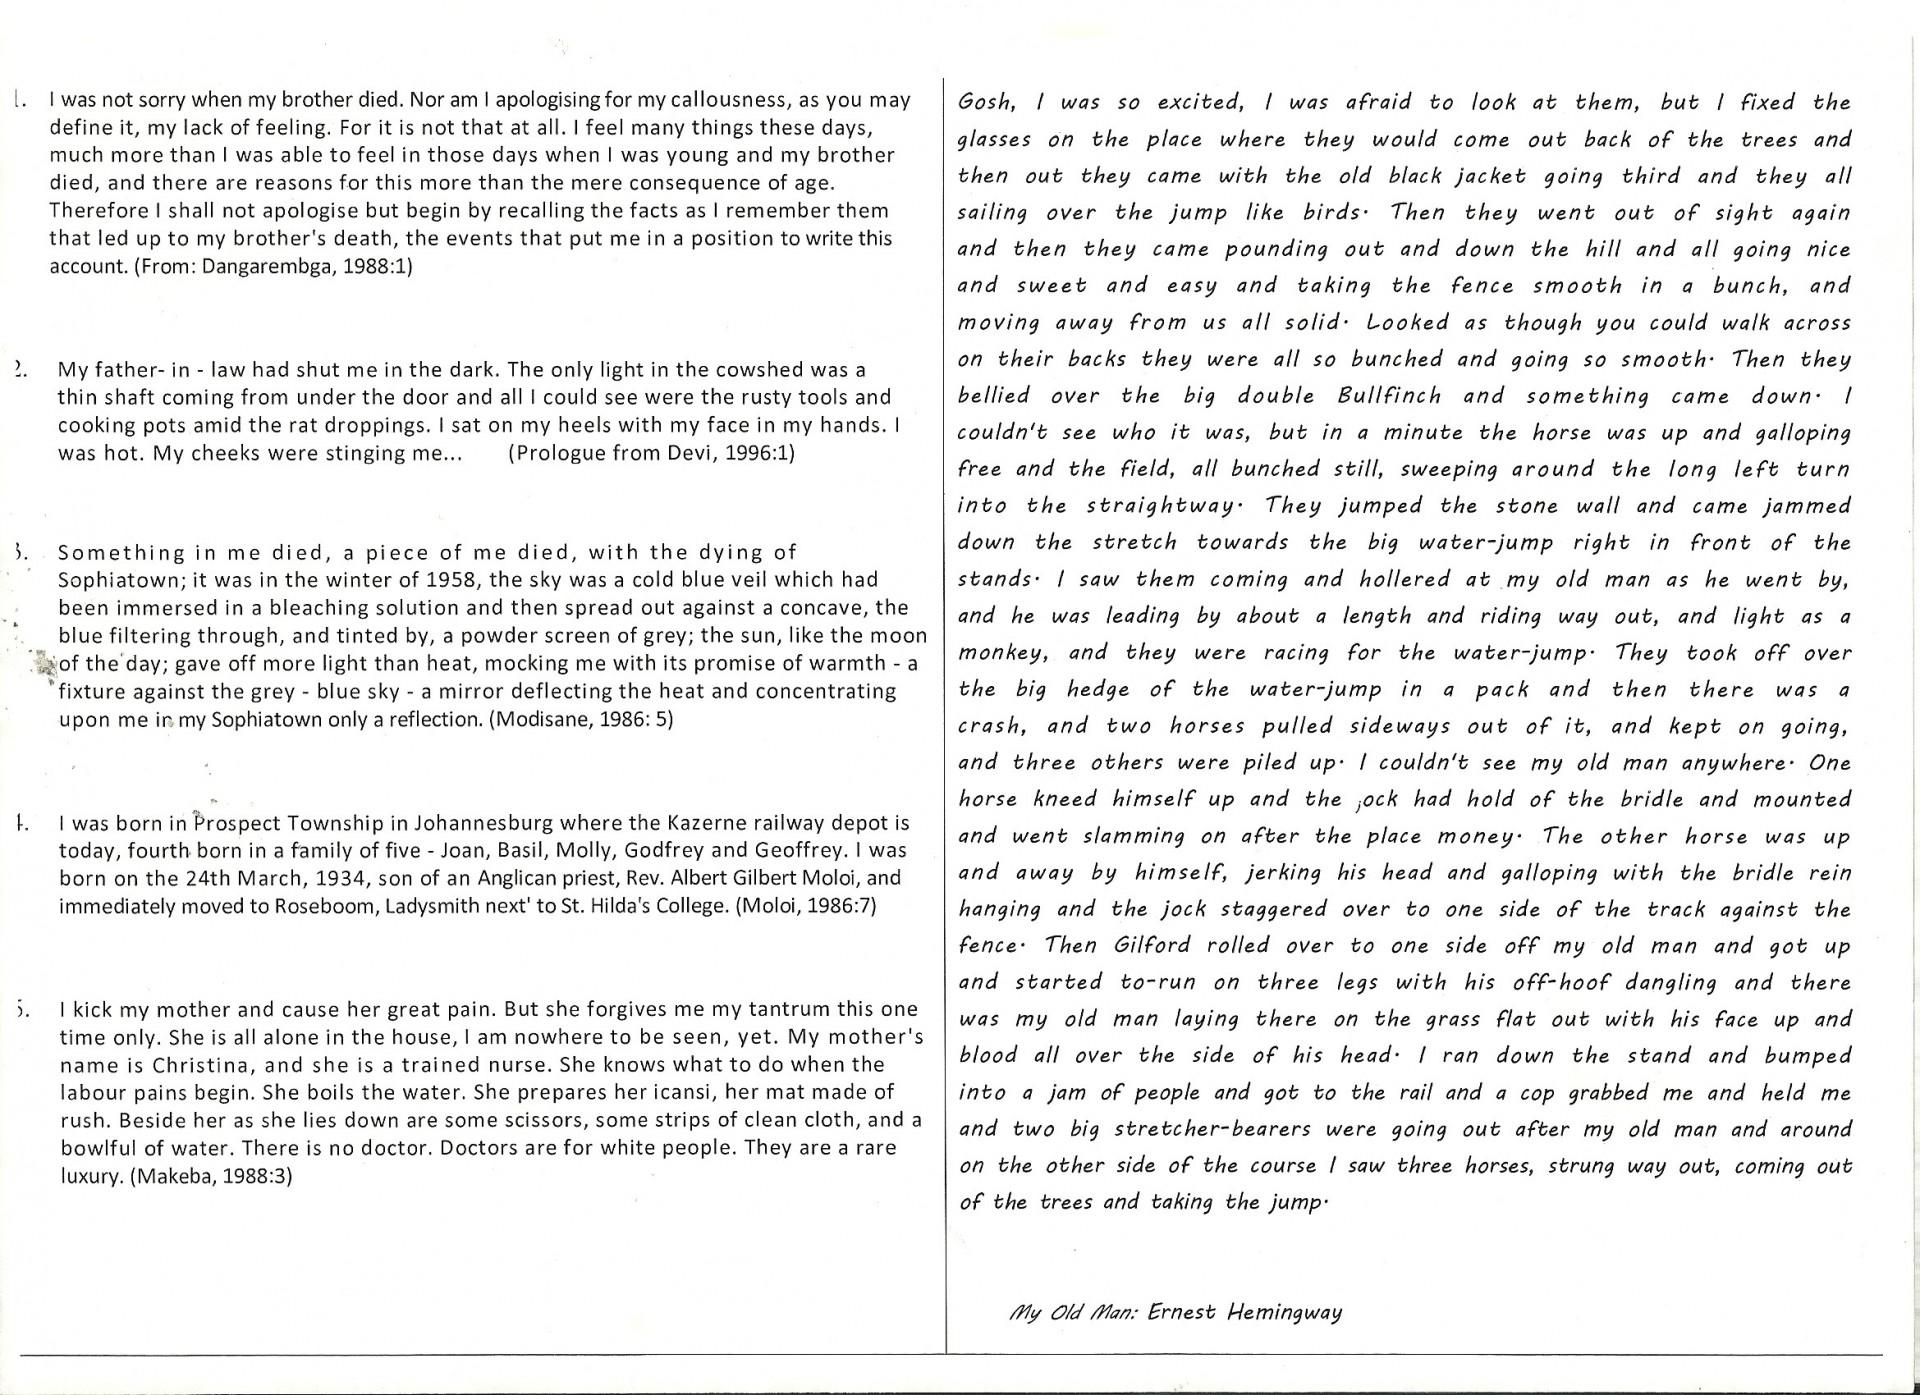 011 Good Vs Essay Intros For Essays Unusual Best Introductions Narrative Examples 1920